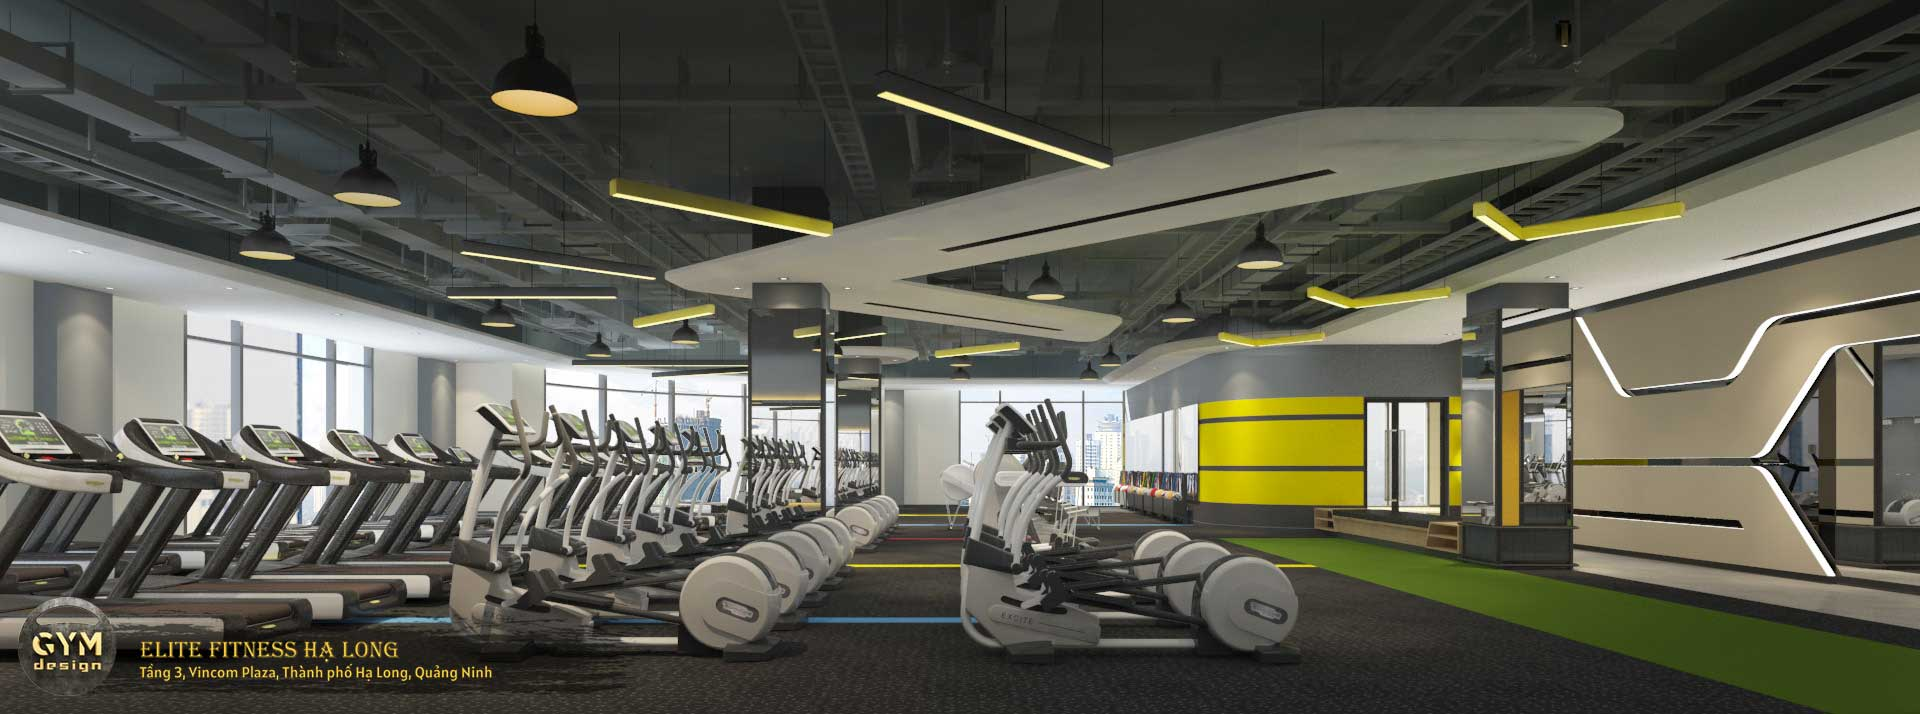 thiet-ke-phong-gym-elite-fitness-ha-long-35